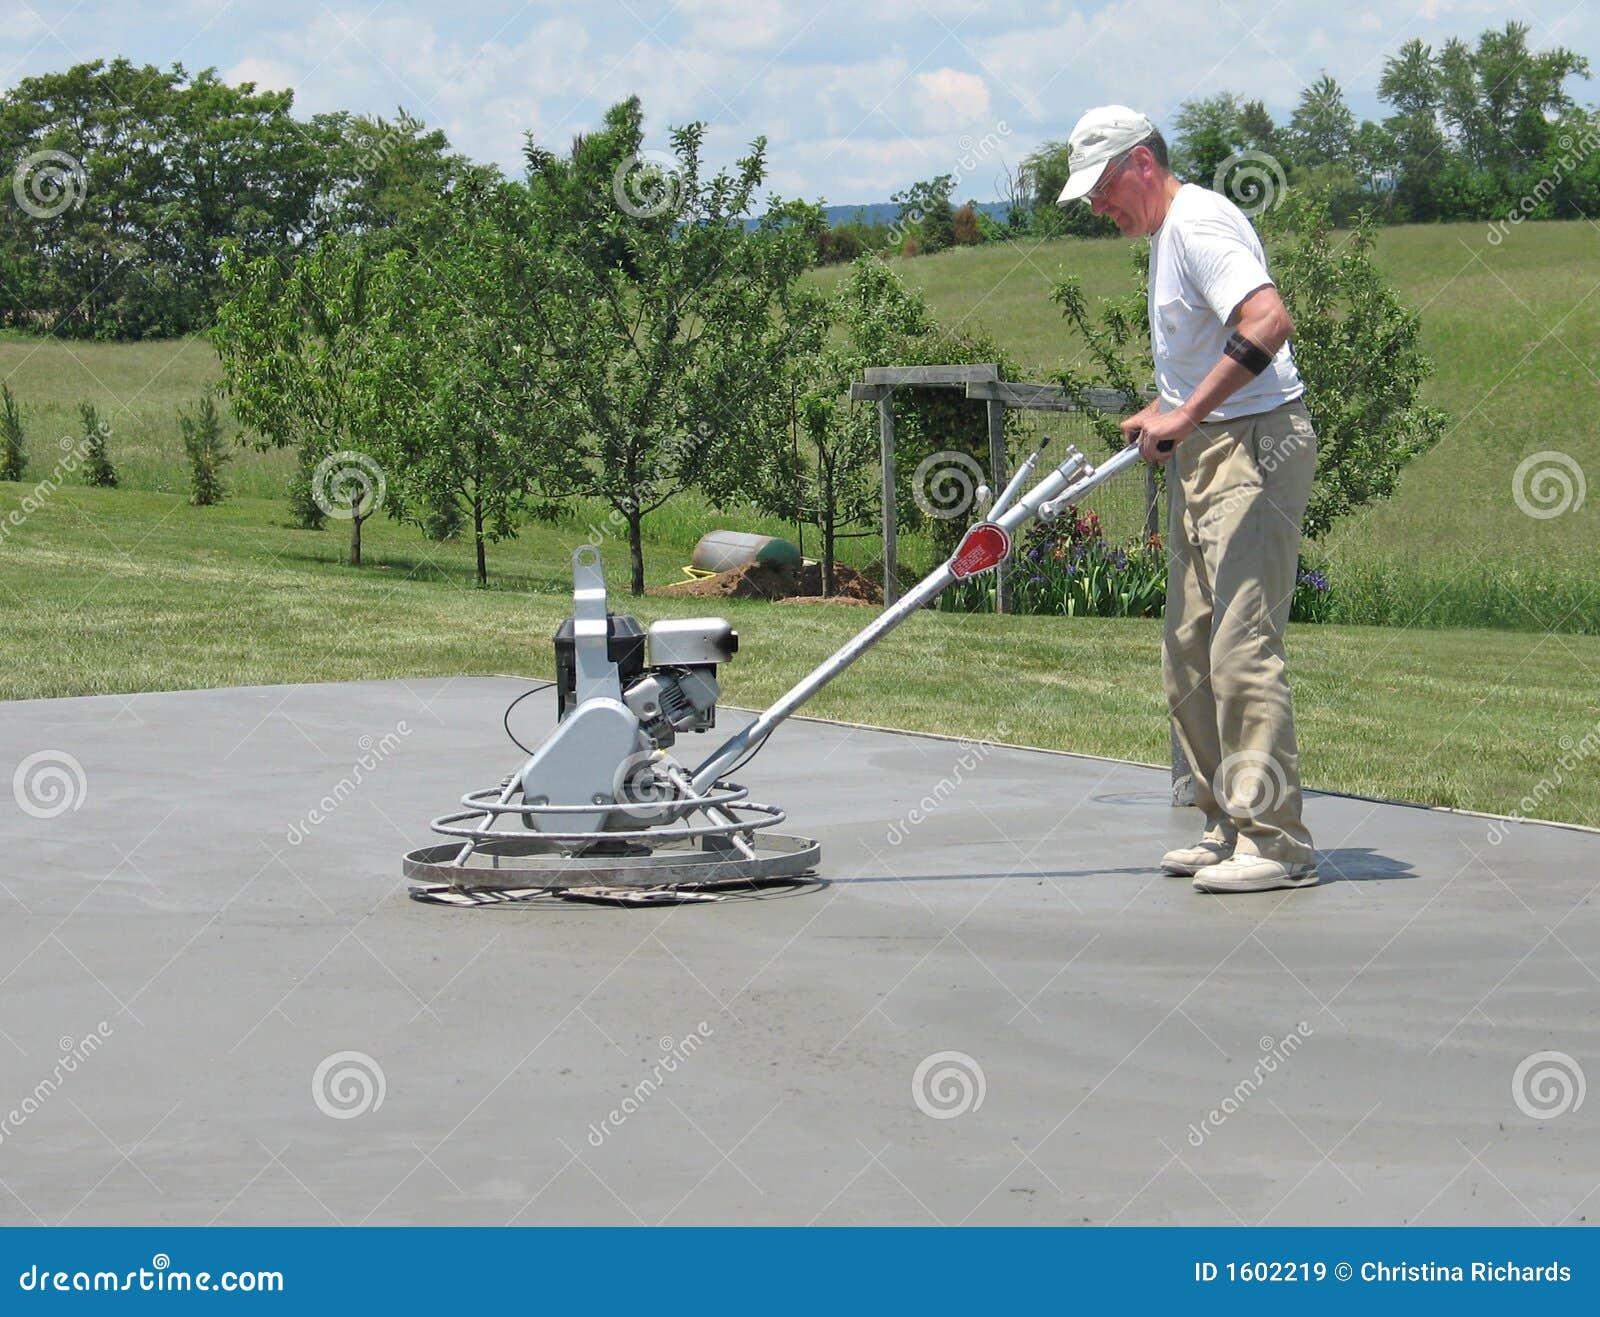 concrete smoothing machine